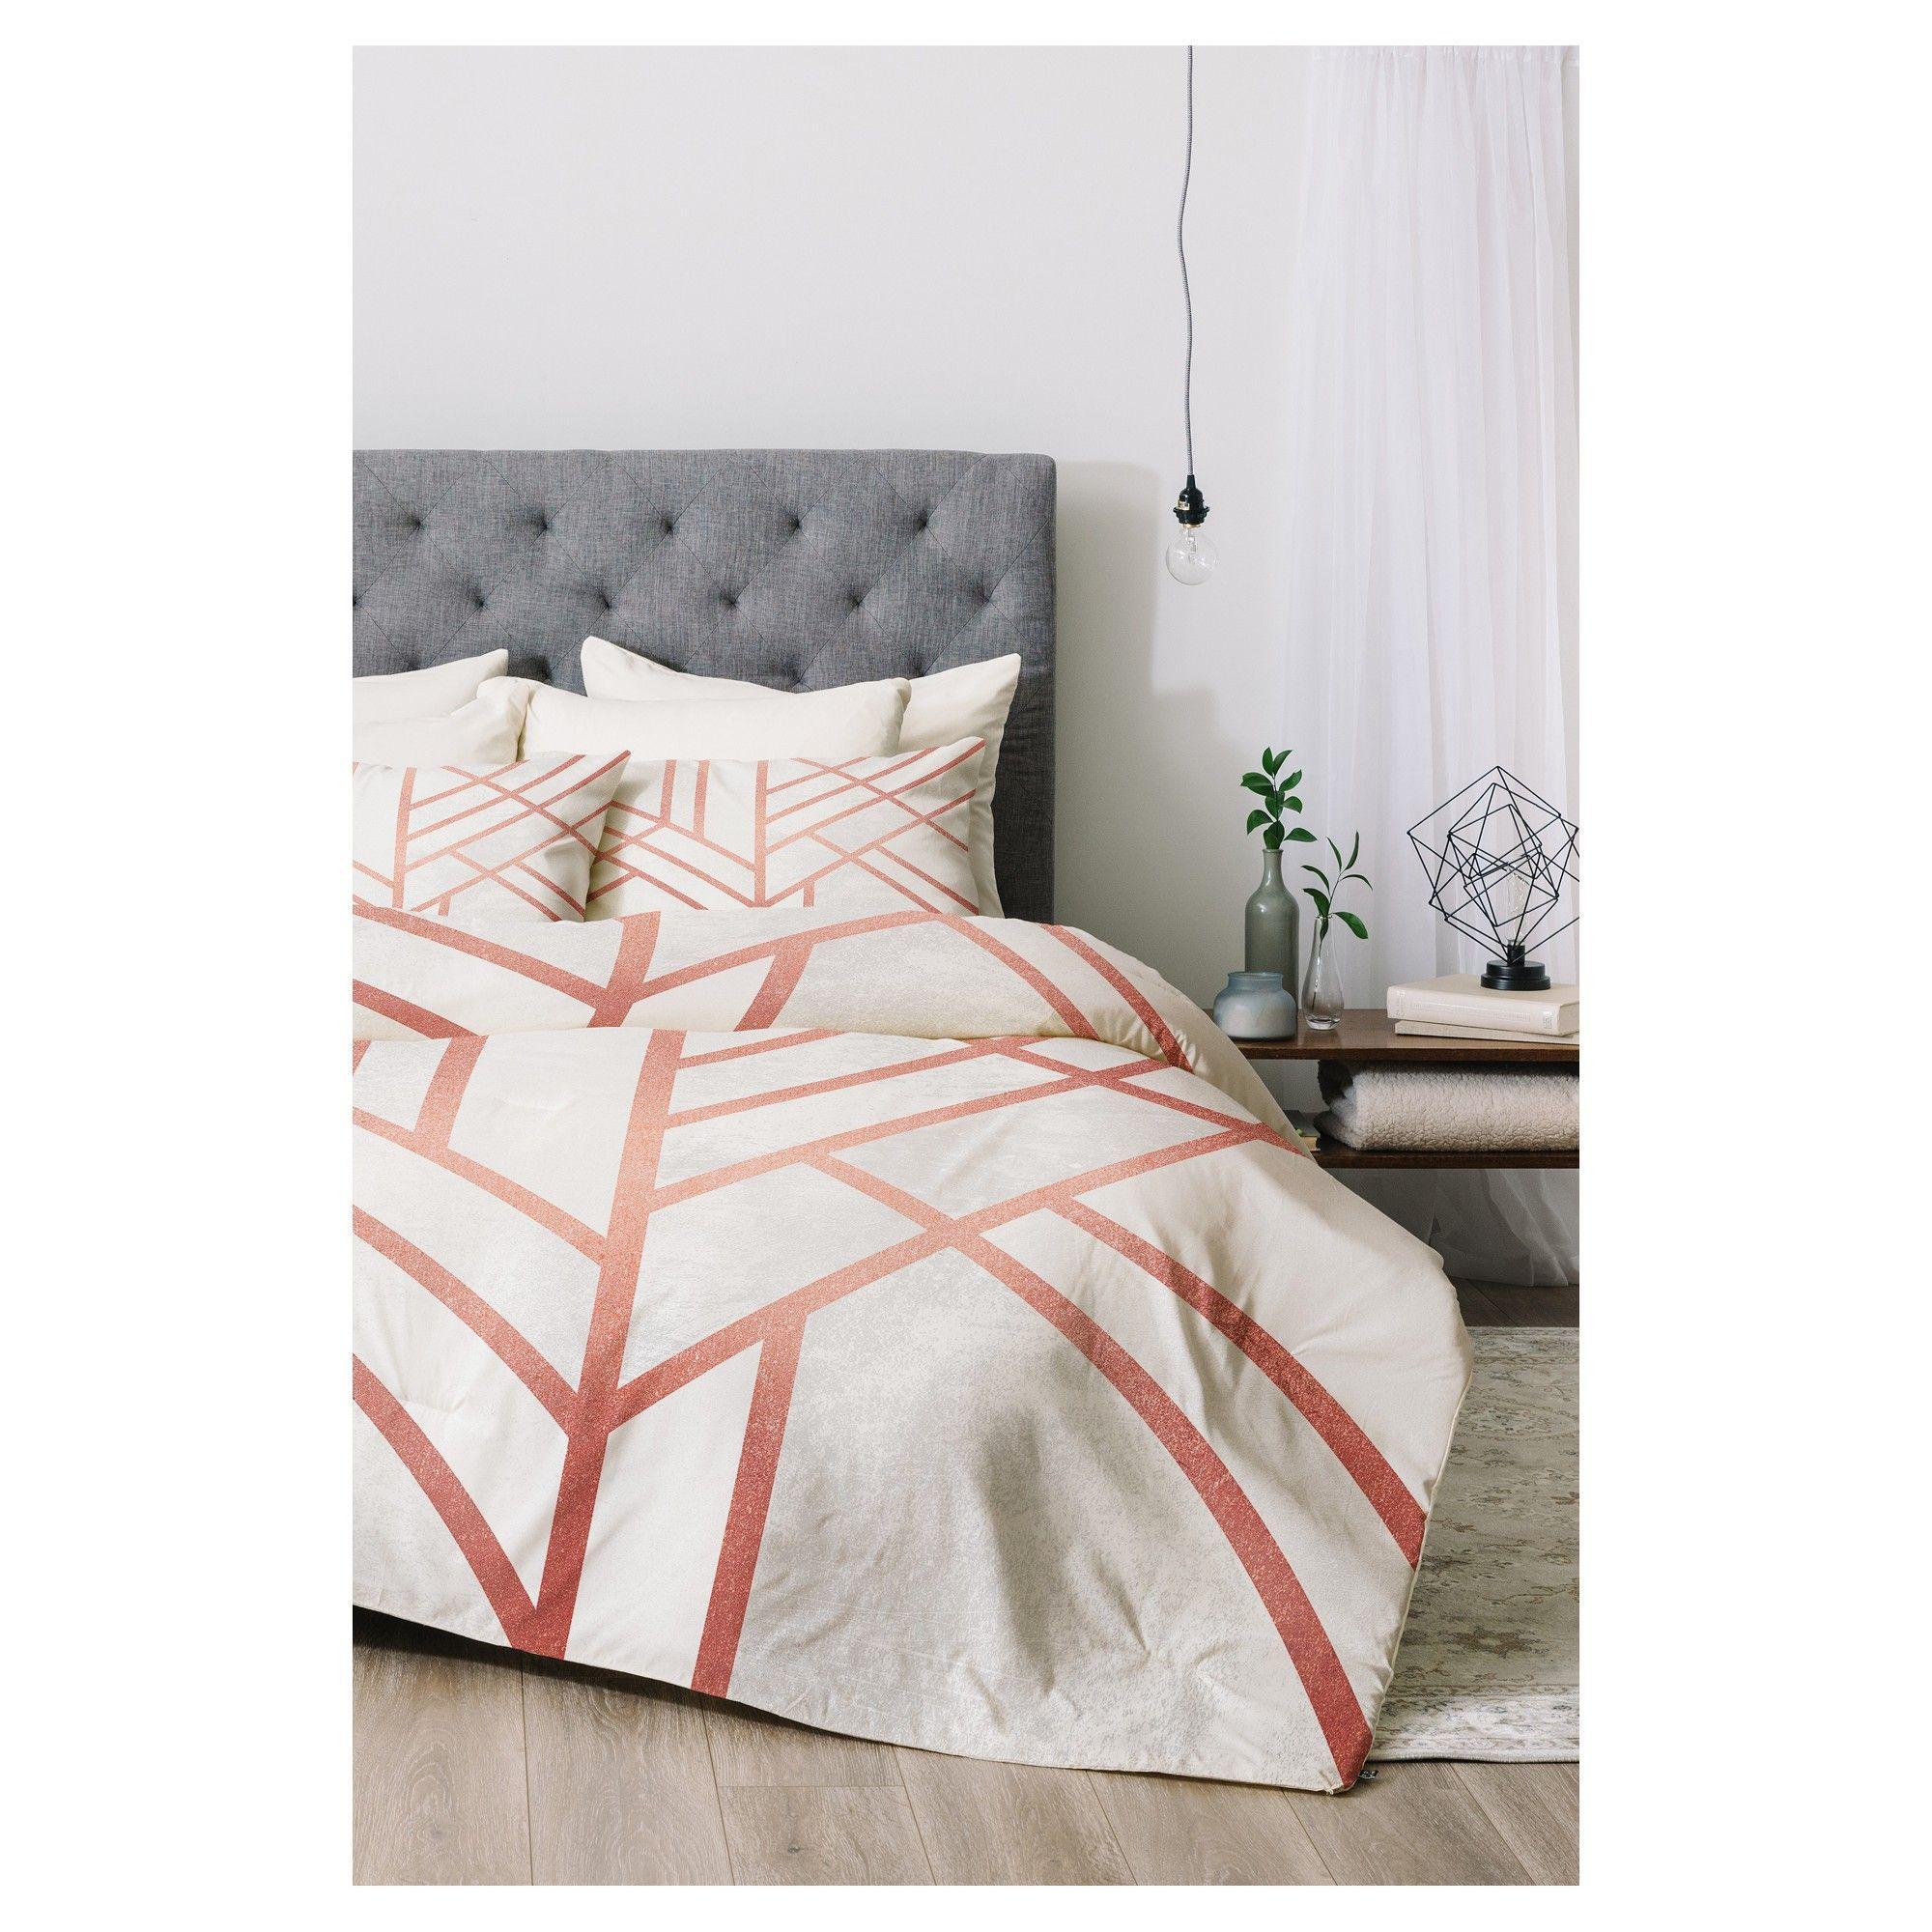 Pink Elisabeth Fredriksson Art Deco Comforter Set (Twin XL